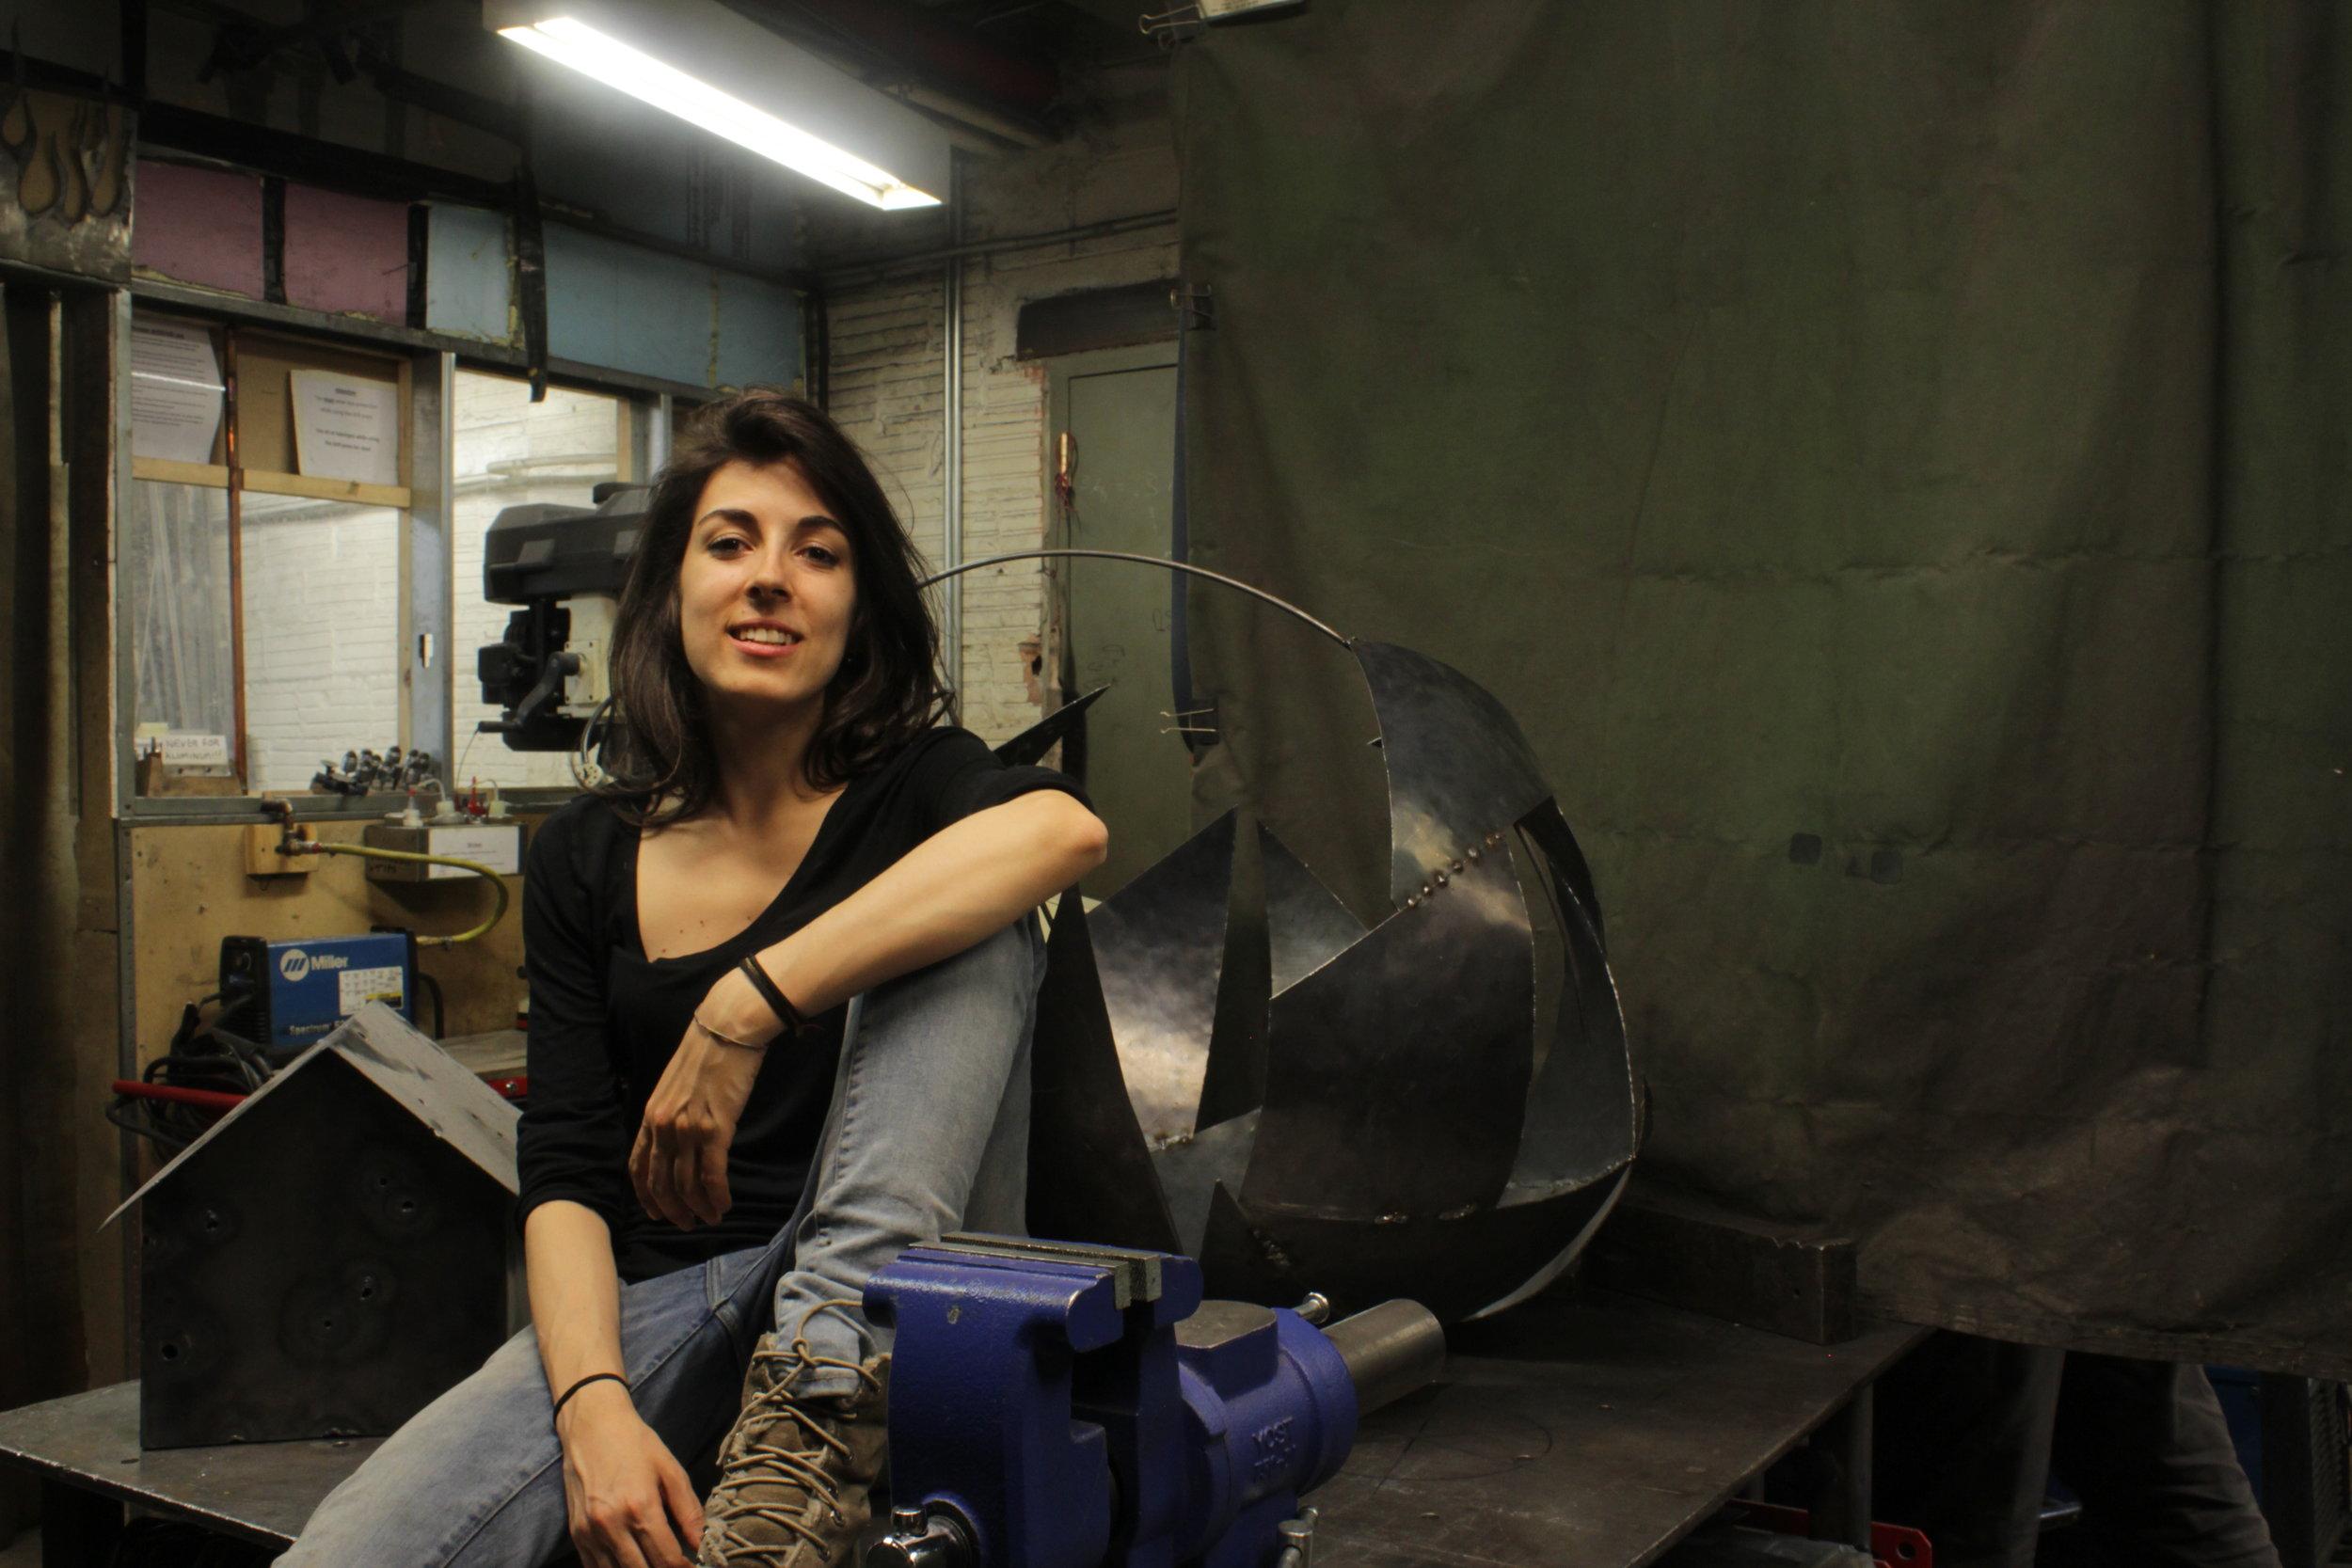 - 7Tracks: Bruna D'AlessandroIntrview by Martina Tiberti5 Maggio 2015